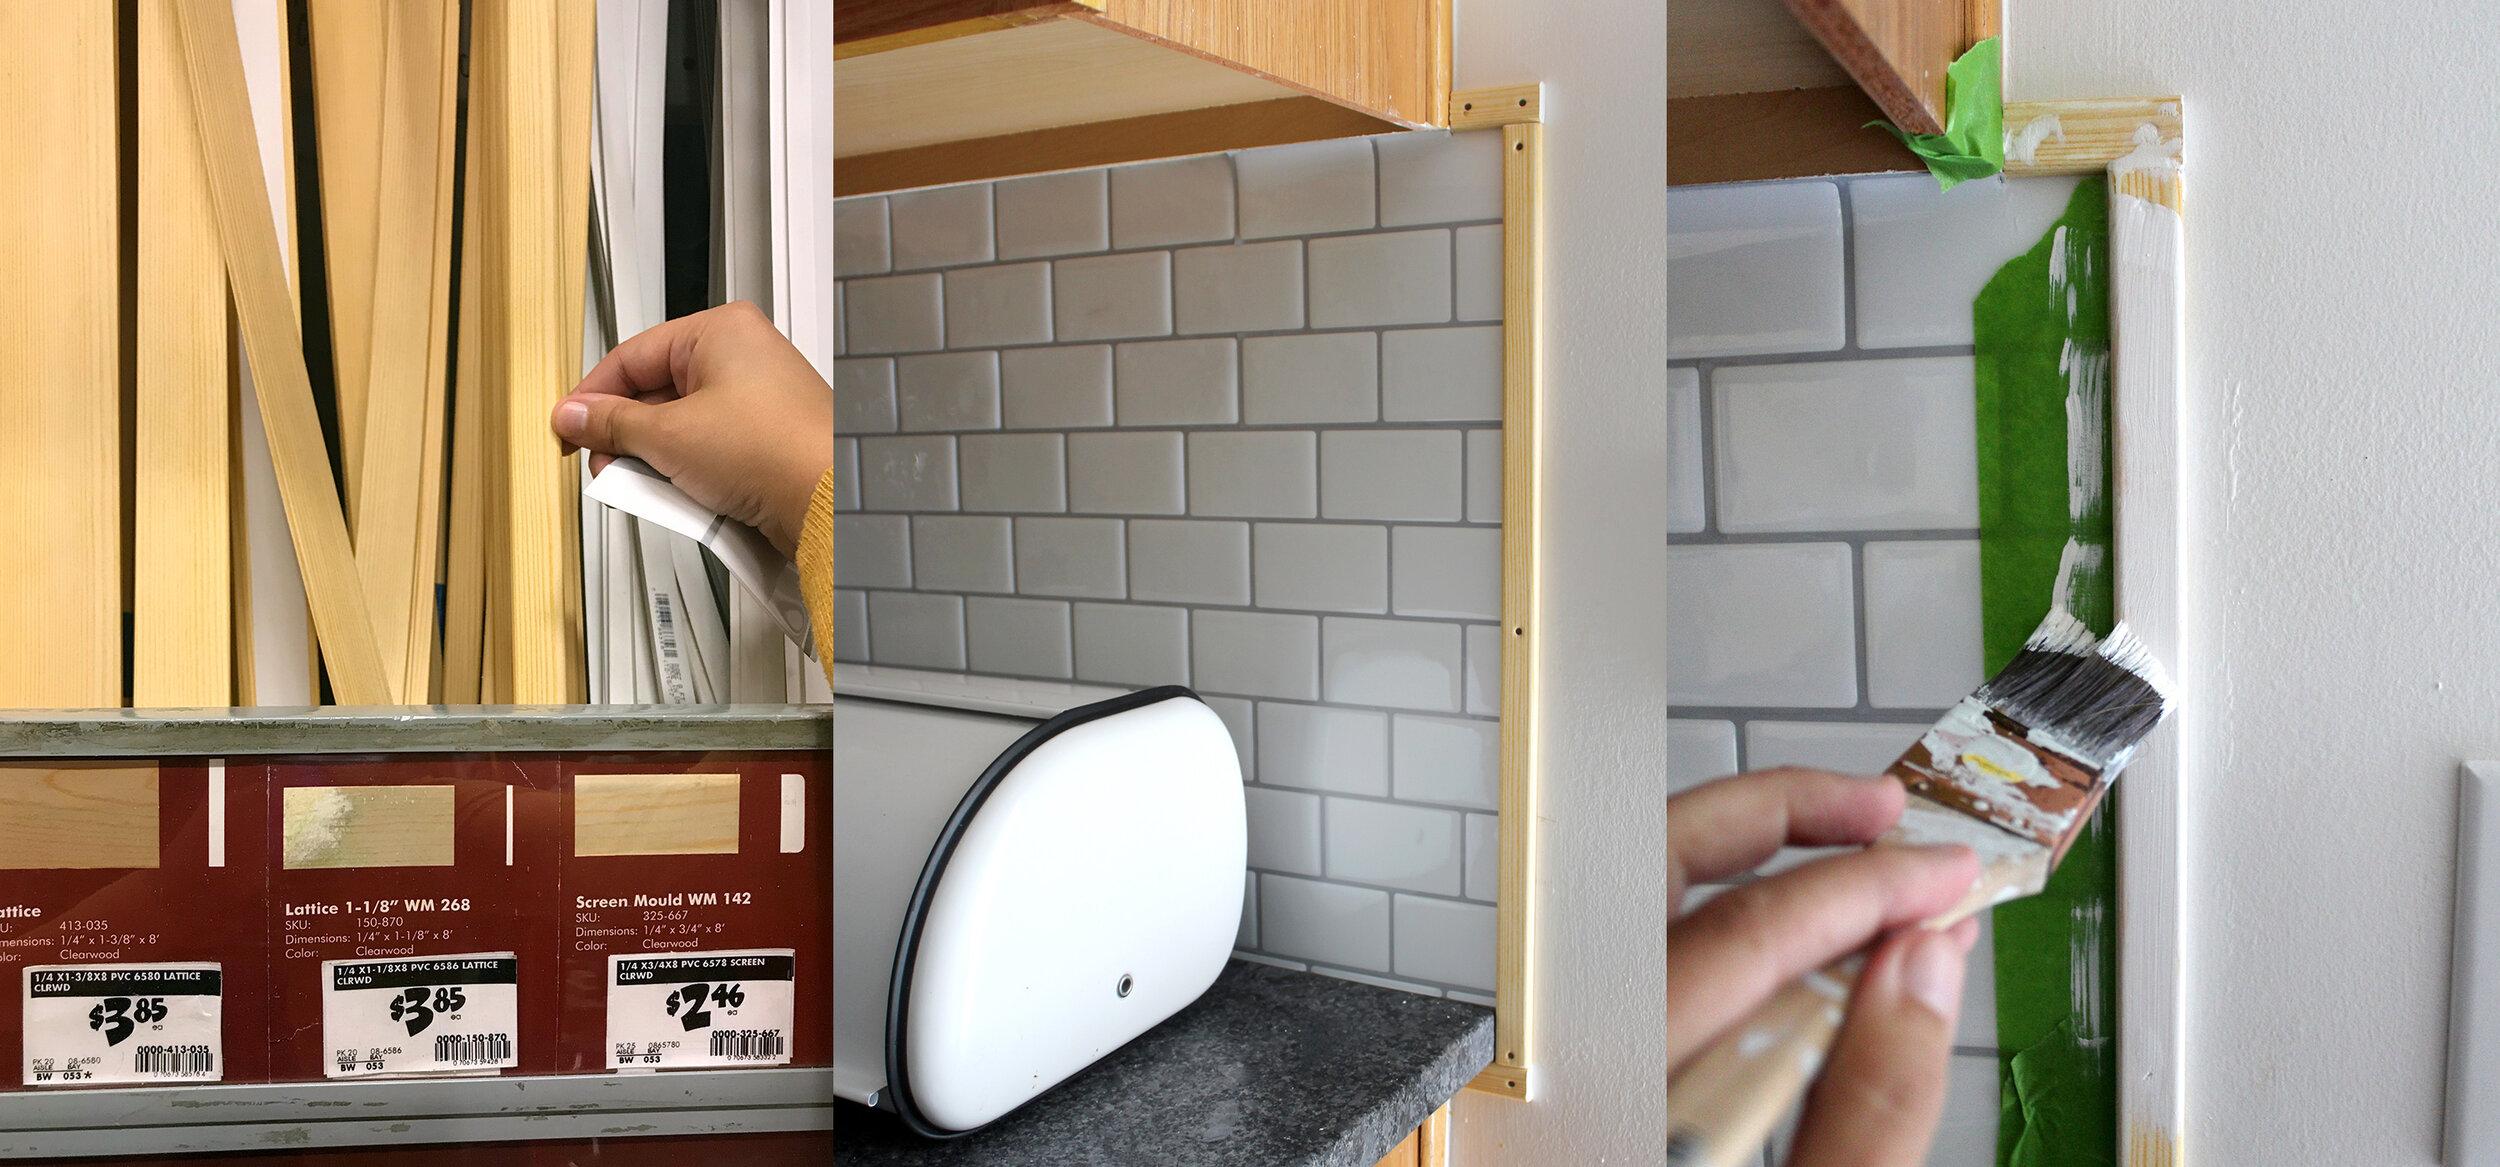 10 Unique Backsplash Ideas For The Kitchen — Tag & Tibby Design